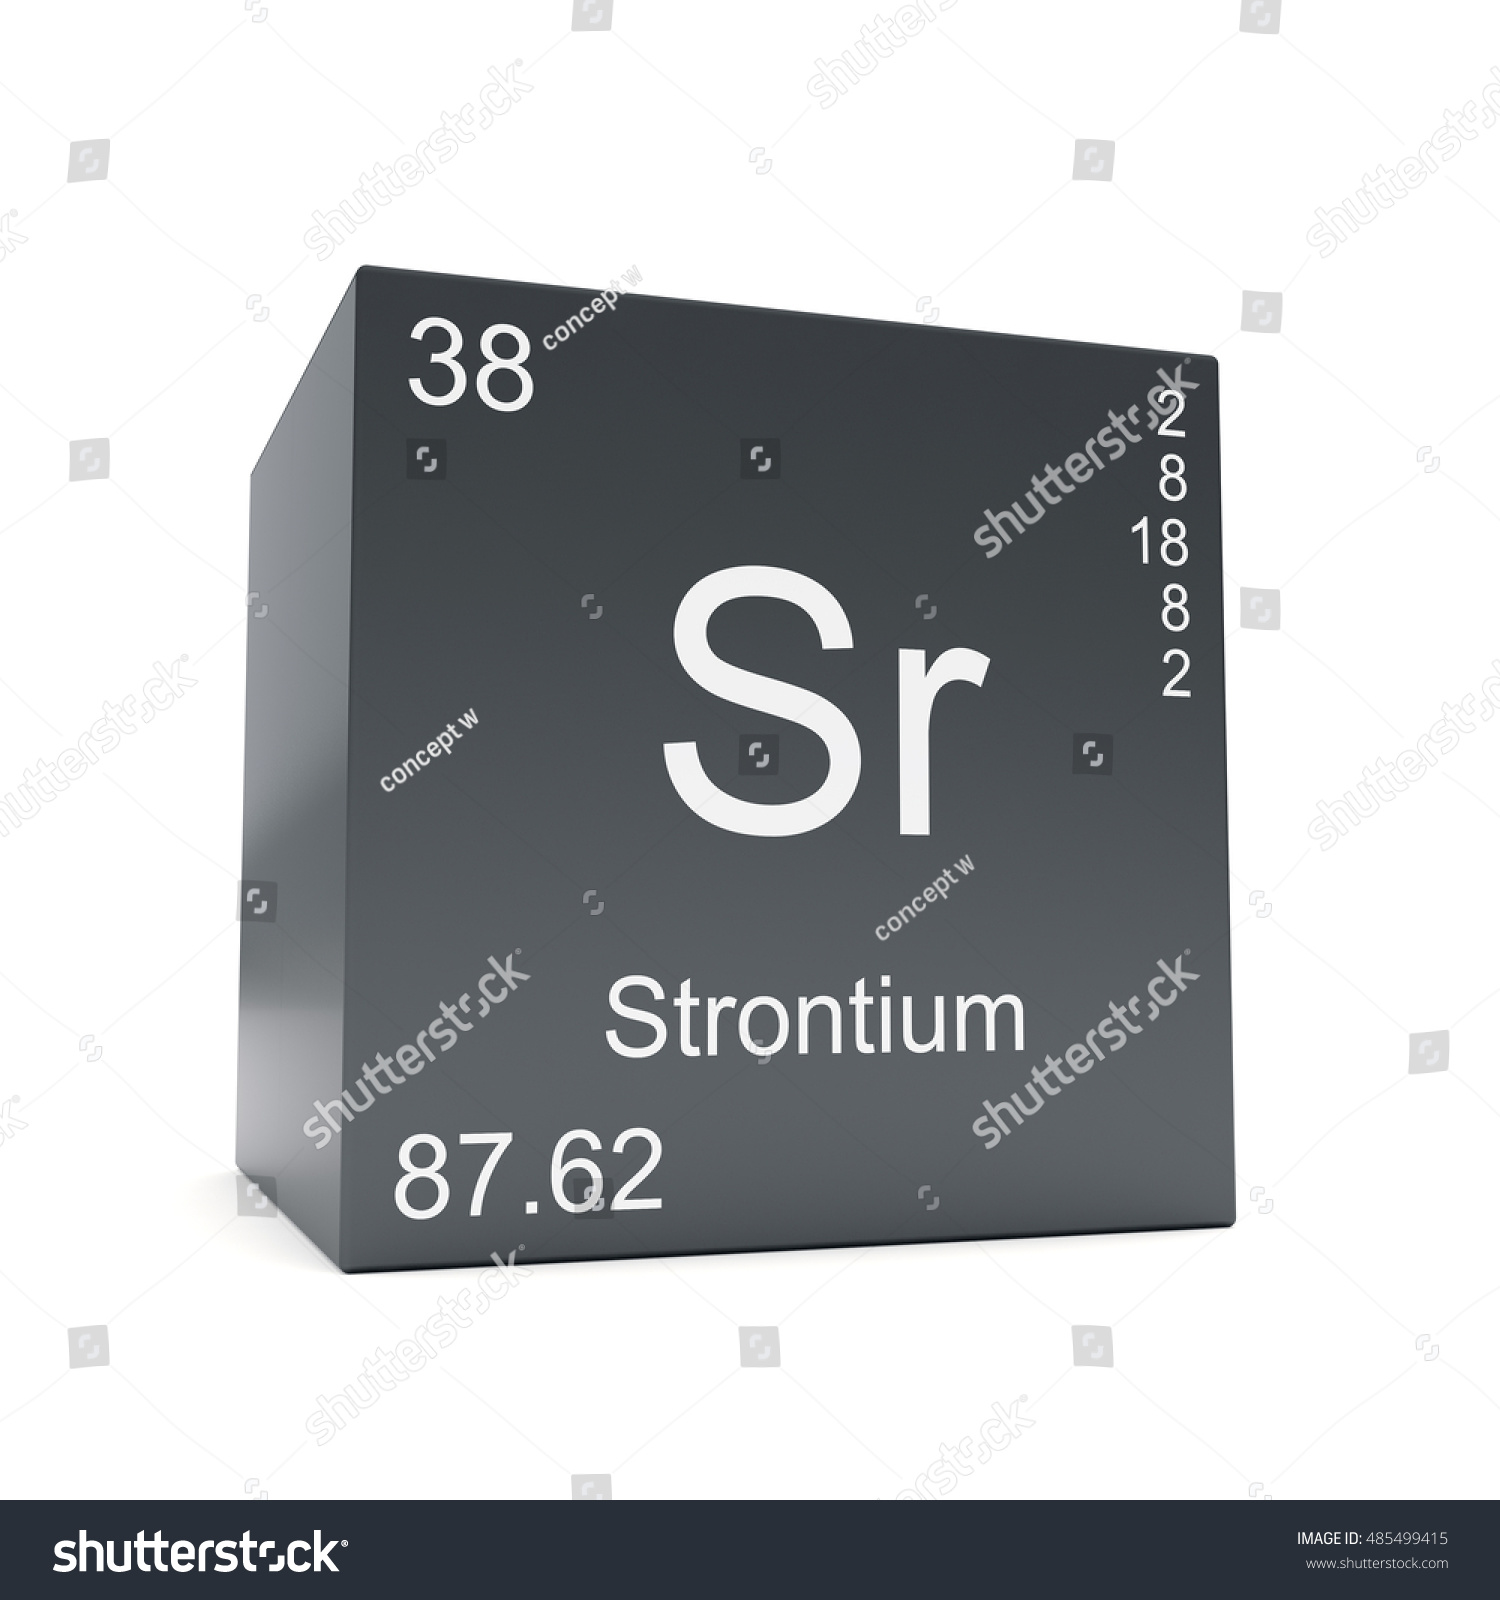 Strontium chemical element symbol periodic table stock strontium chemical element symbol from the periodic table displayed on black cube 3d render biocorpaavc